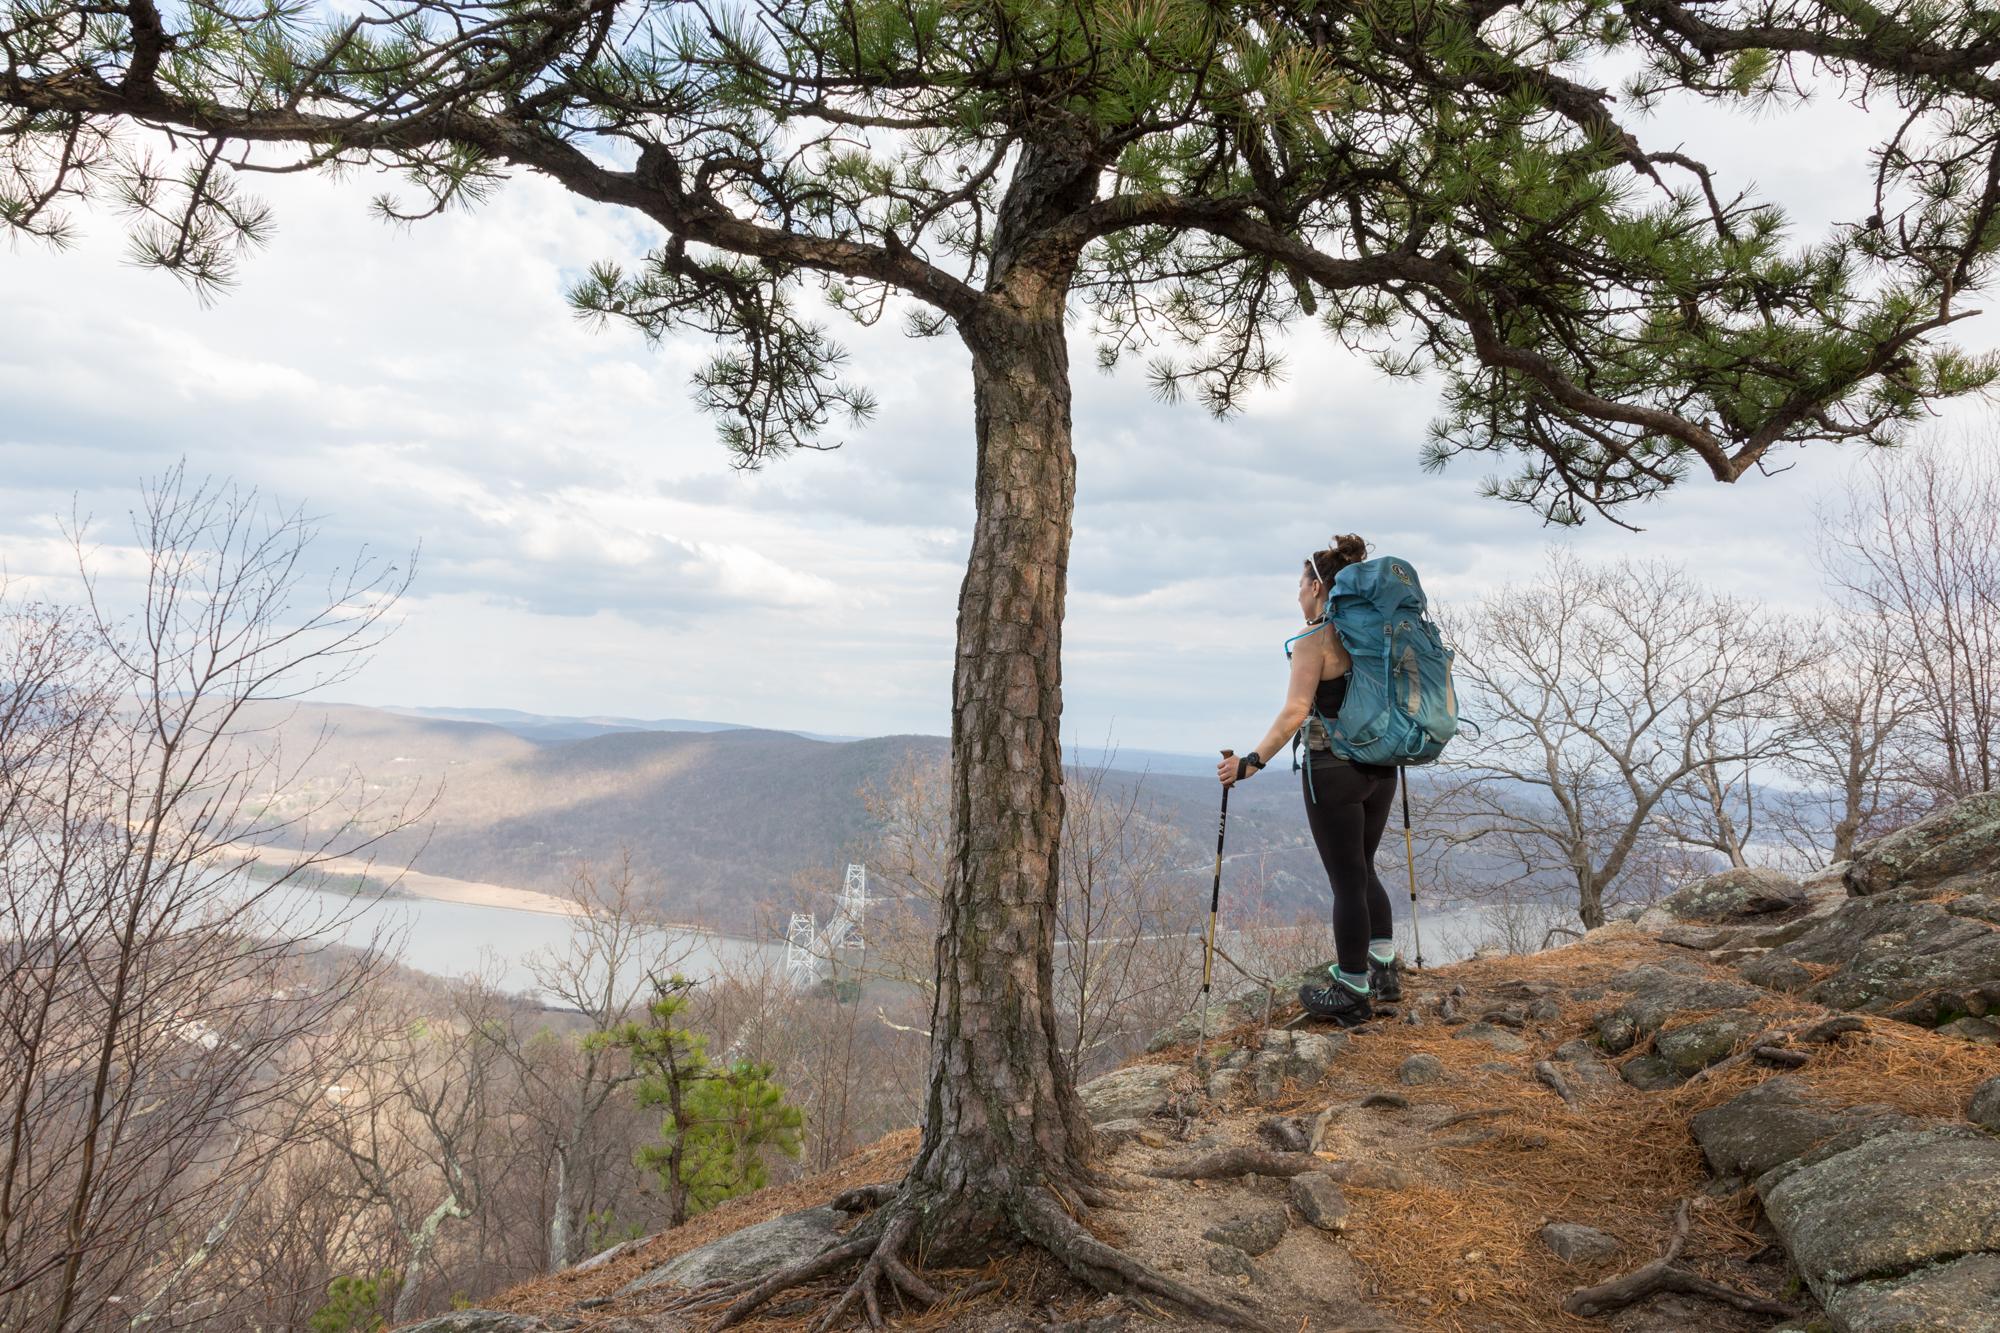 20160325_Hiking_Bear Mountain with Angela_004.jpg